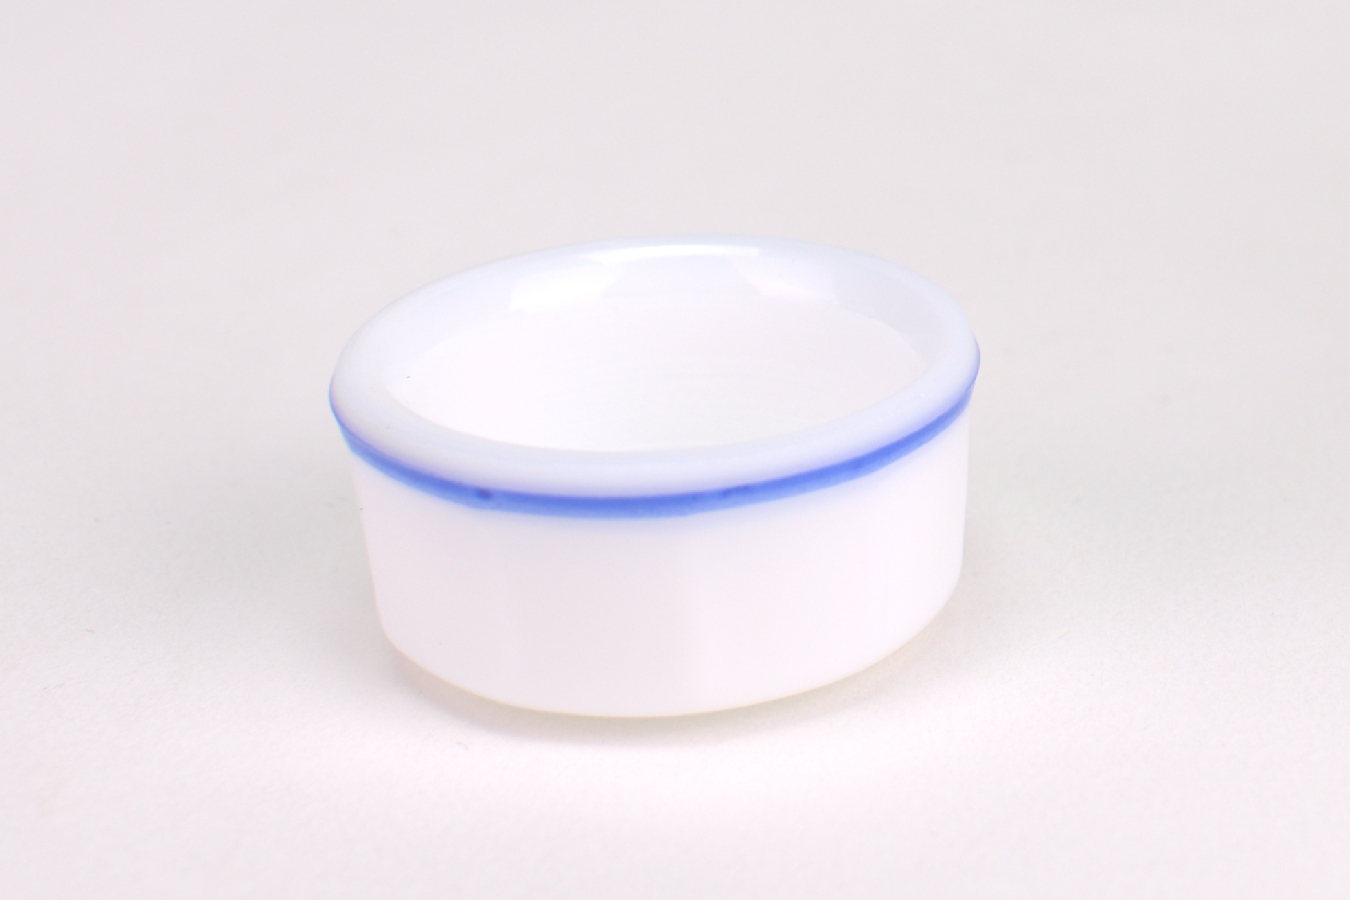 Kappenglasdeckel opal blau 698.25  St